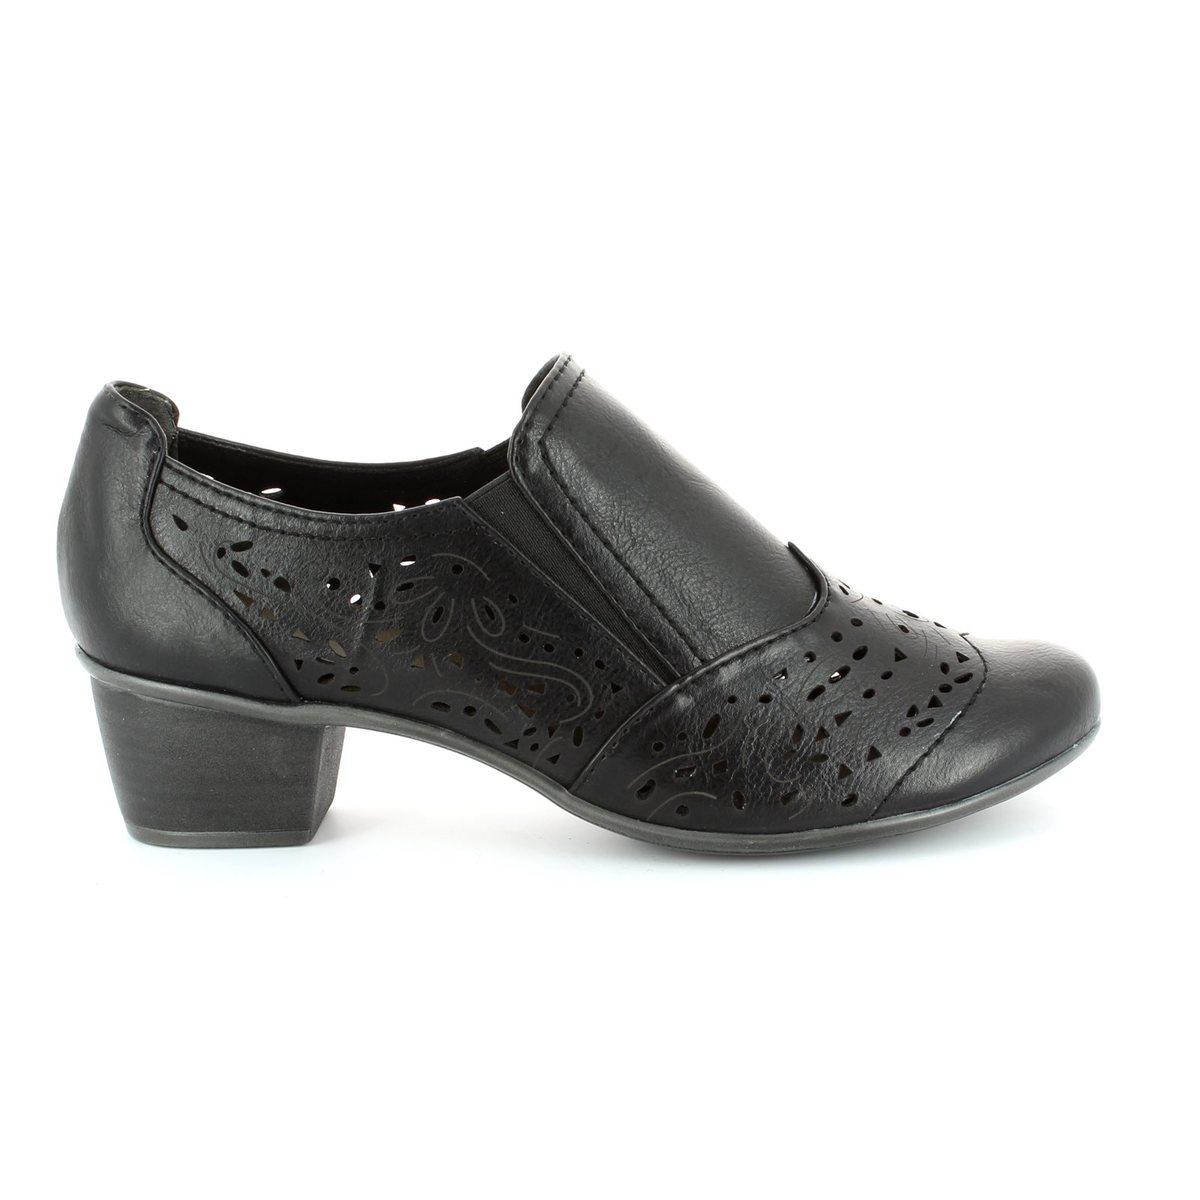 marco tozzi alipio 24502 002 black shoe boots. Black Bedroom Furniture Sets. Home Design Ideas